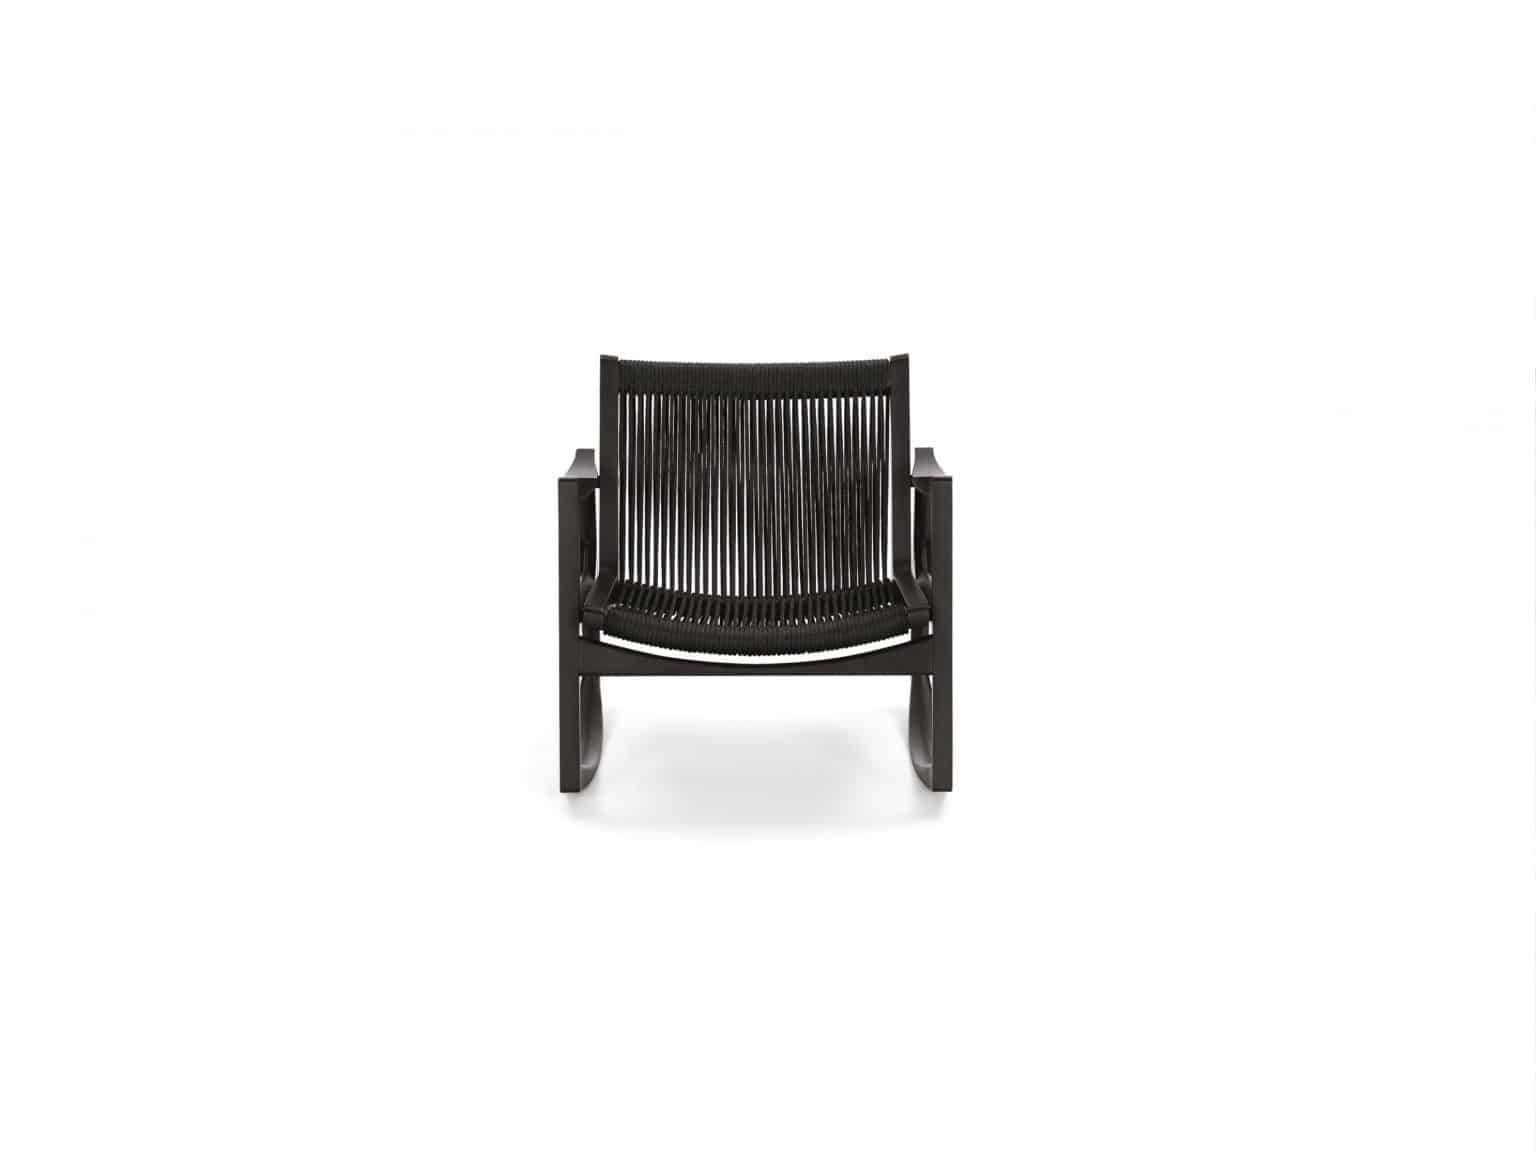 ClassiCon fauteuil Euvira Rocking pa